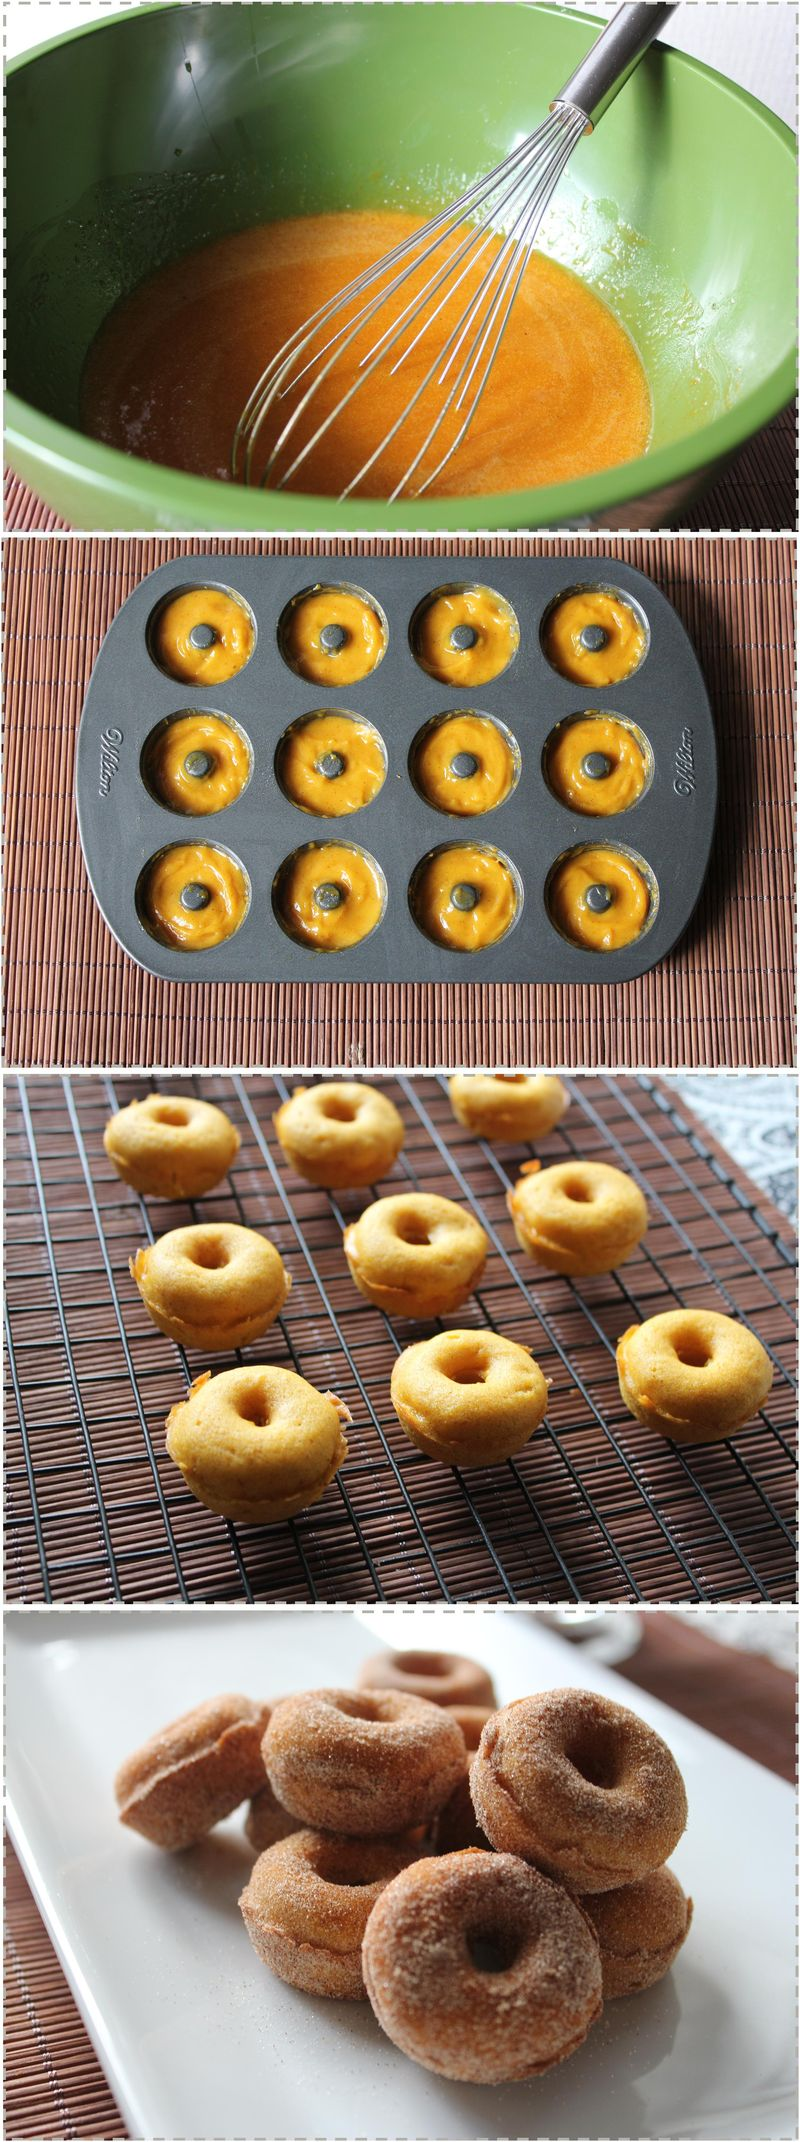 Pumpkin doughnuts steps